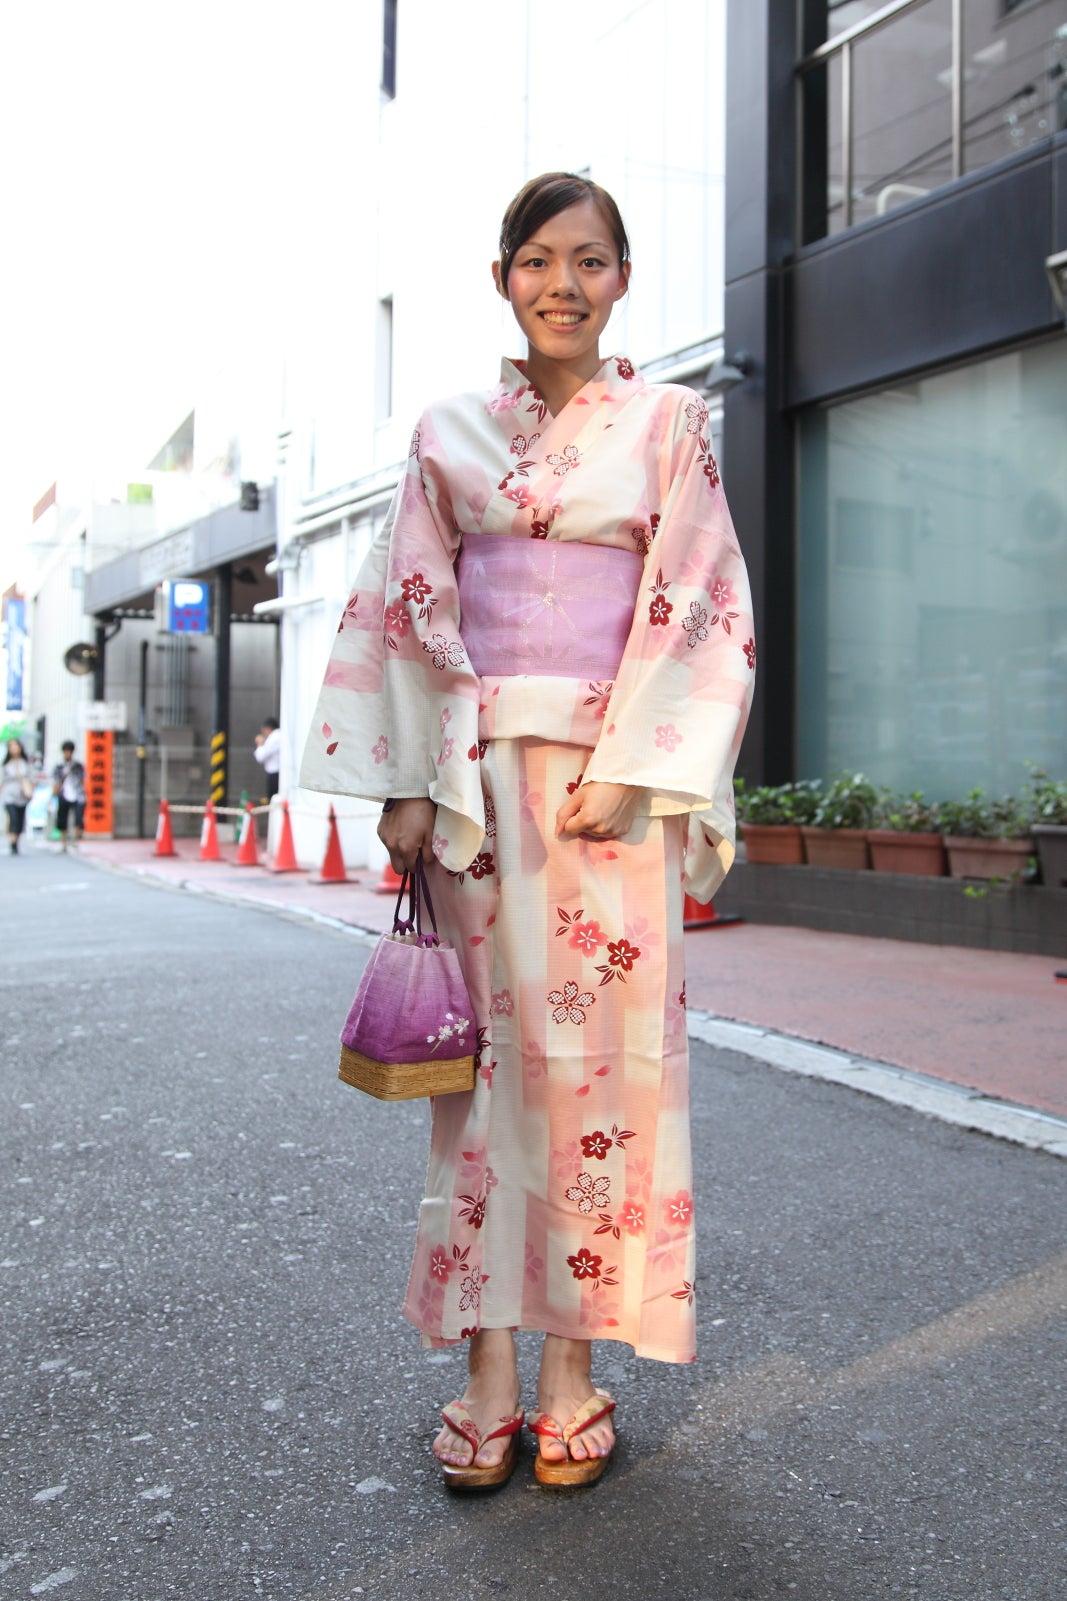 Tokyo street fashion store 92